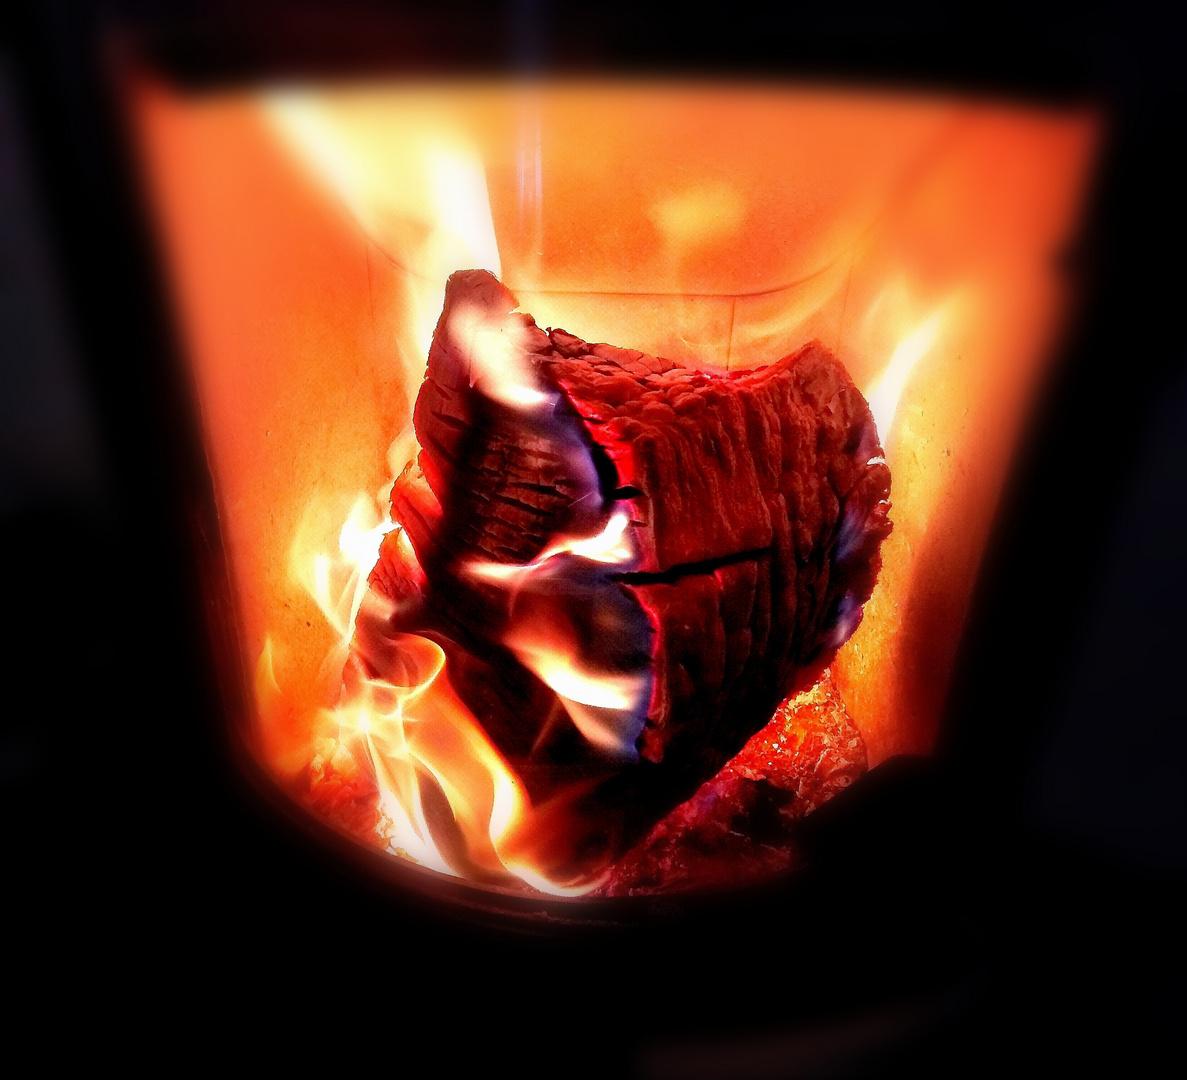 Am Anfang war das Feuer Foto & Bild | monatswettbewerbe ...